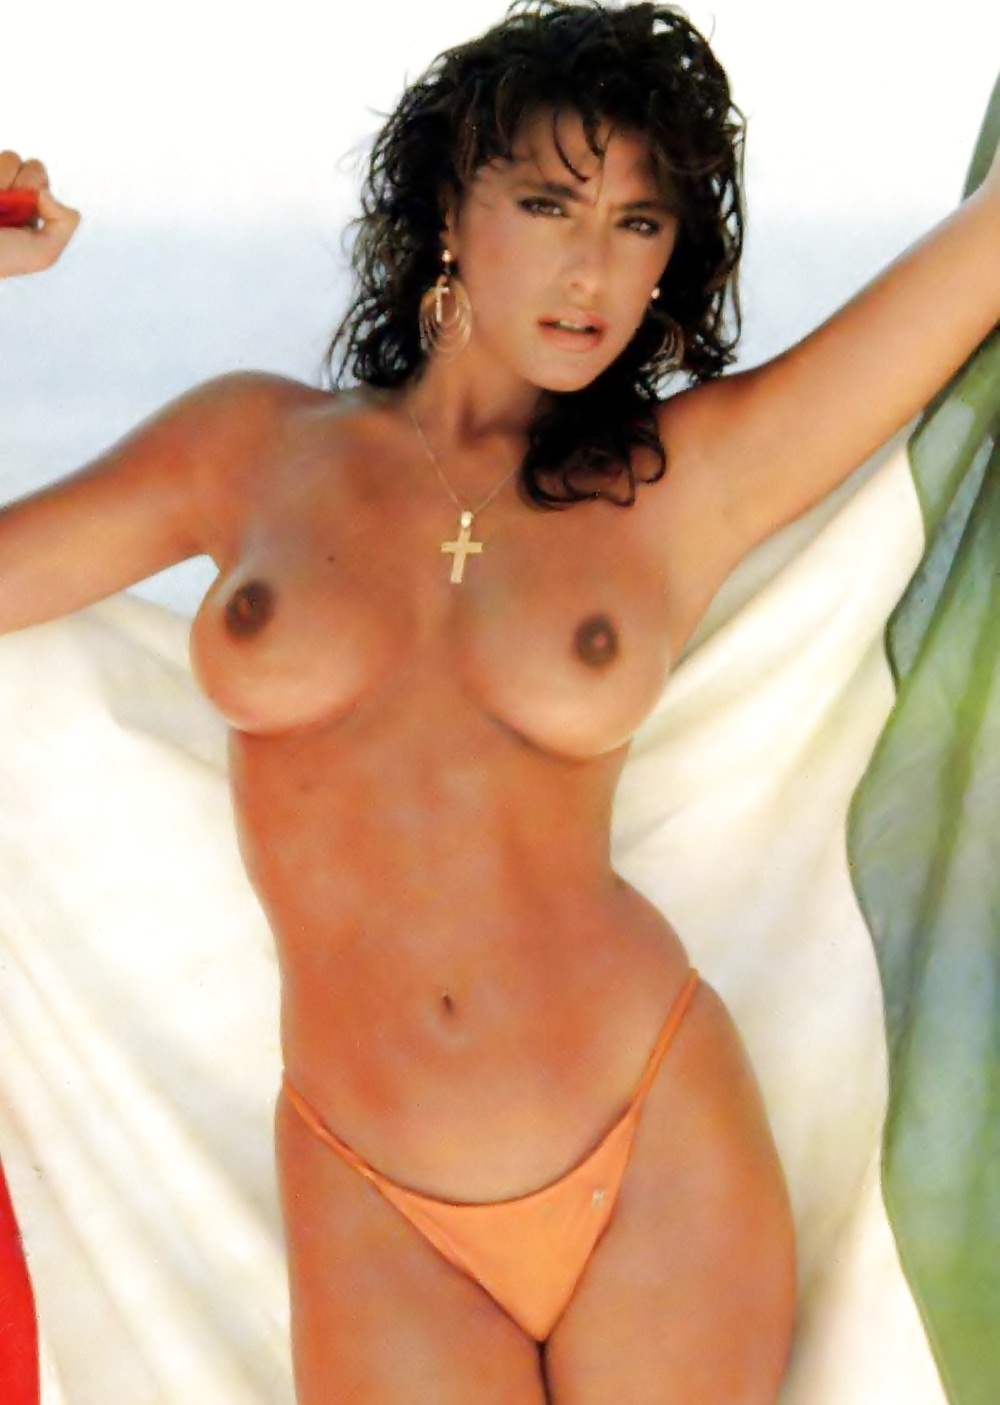 Сабрина салерно абсолютно голая фото